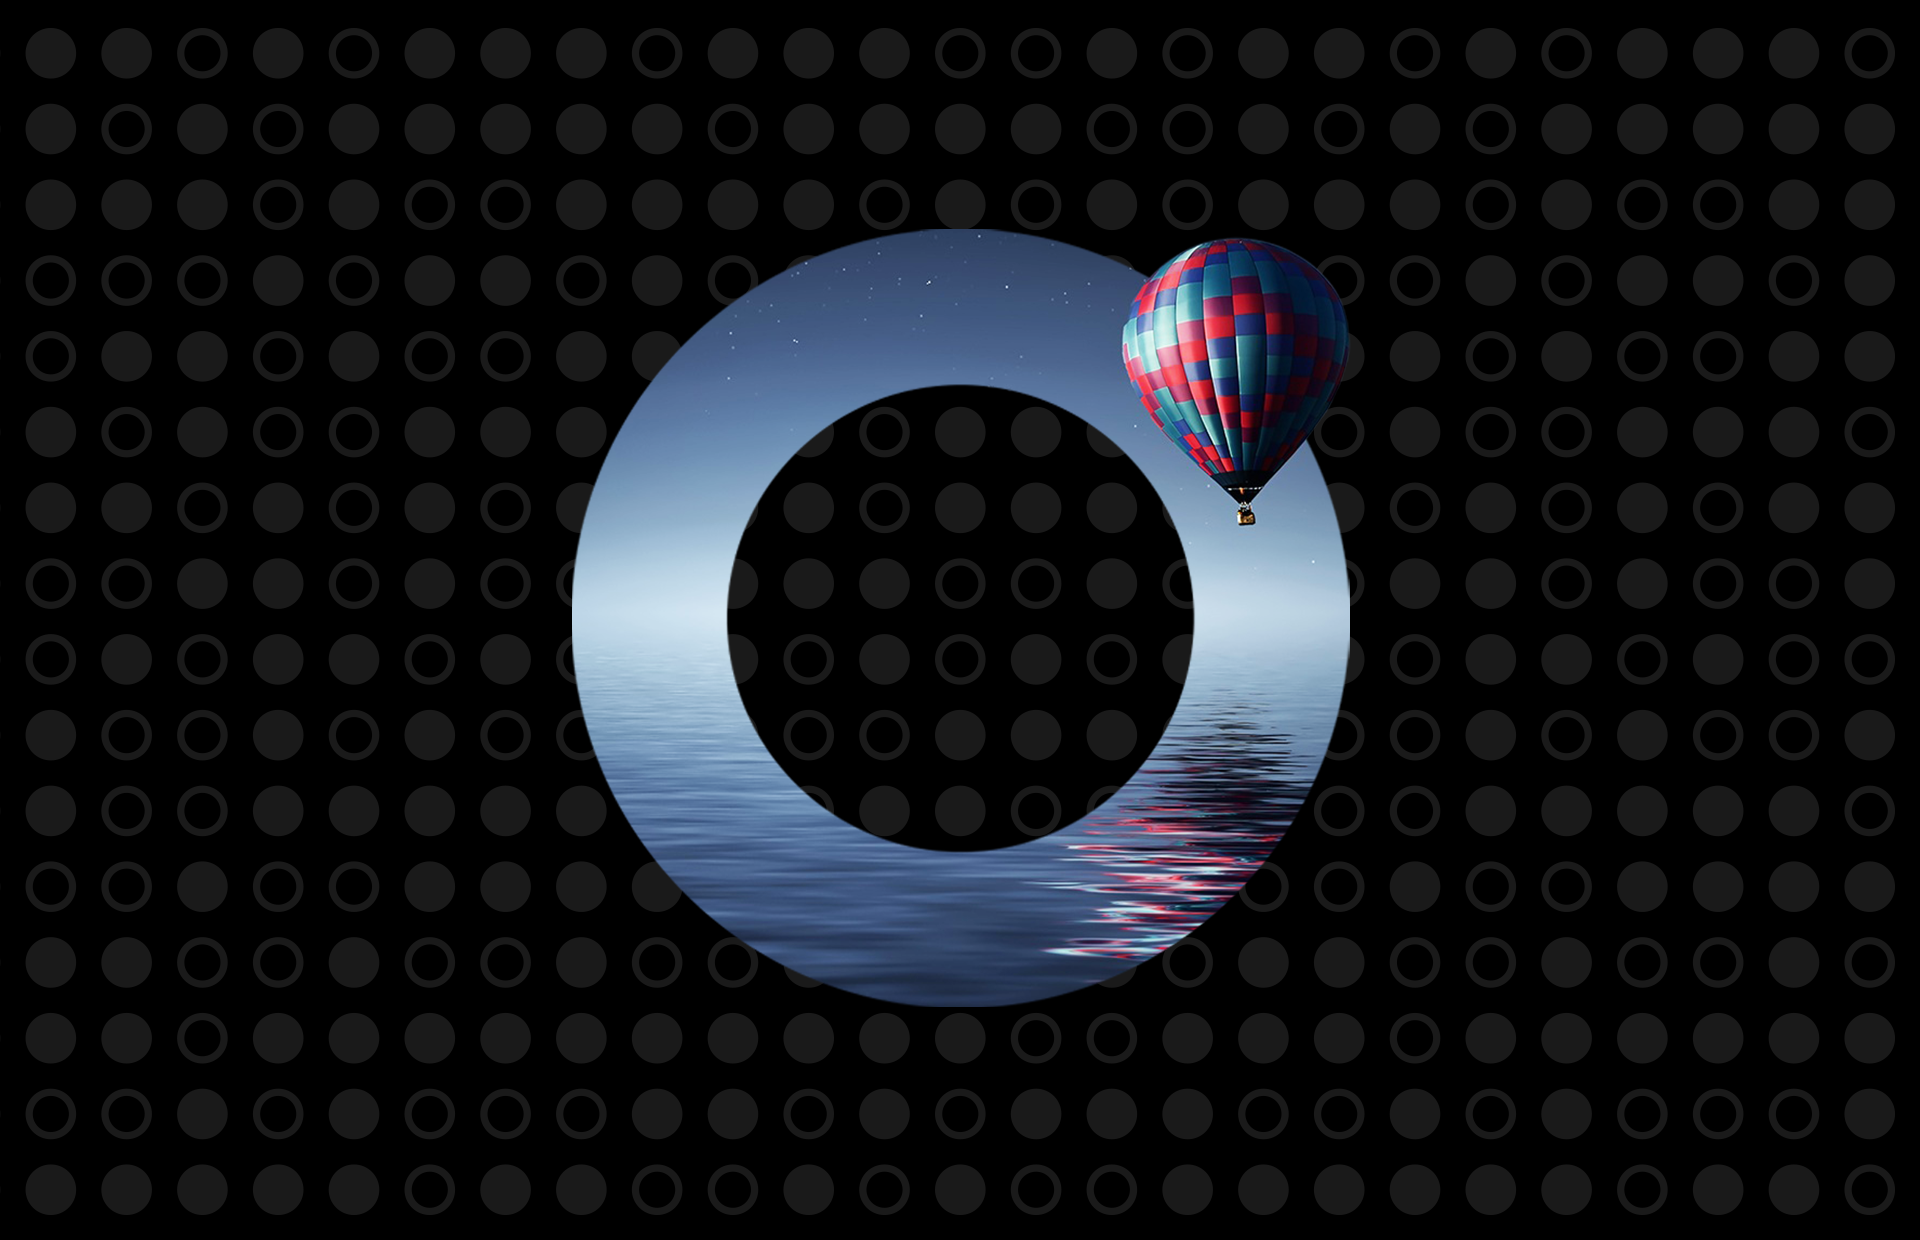 kv balon